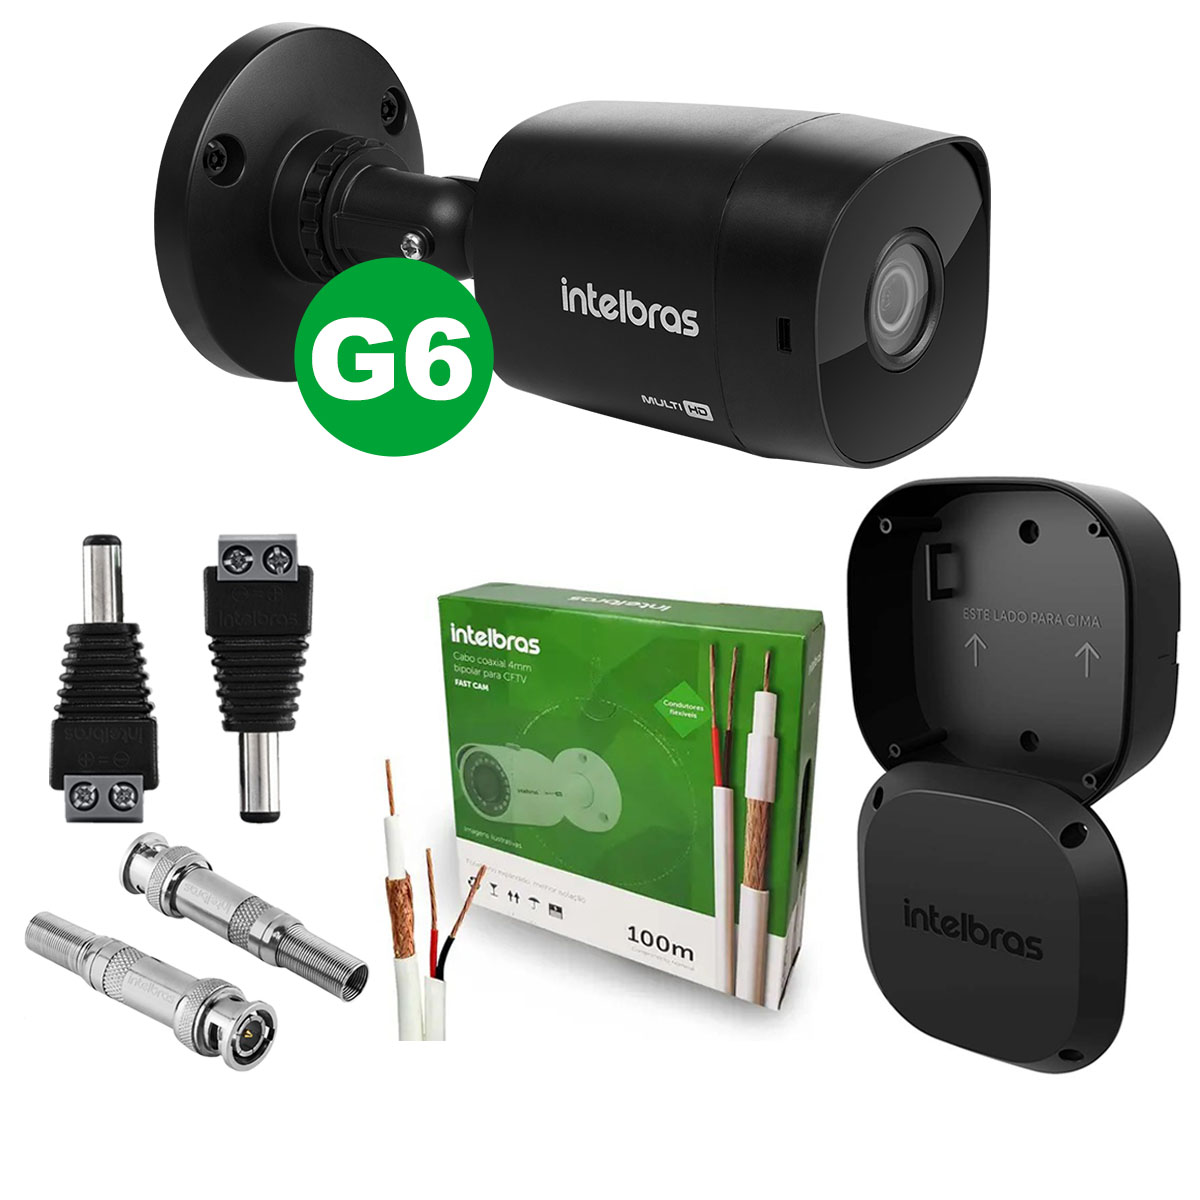 Kit Câmera Intelbras Vhd 1220 Black G6 3,6mm + Cabo + Acessórios